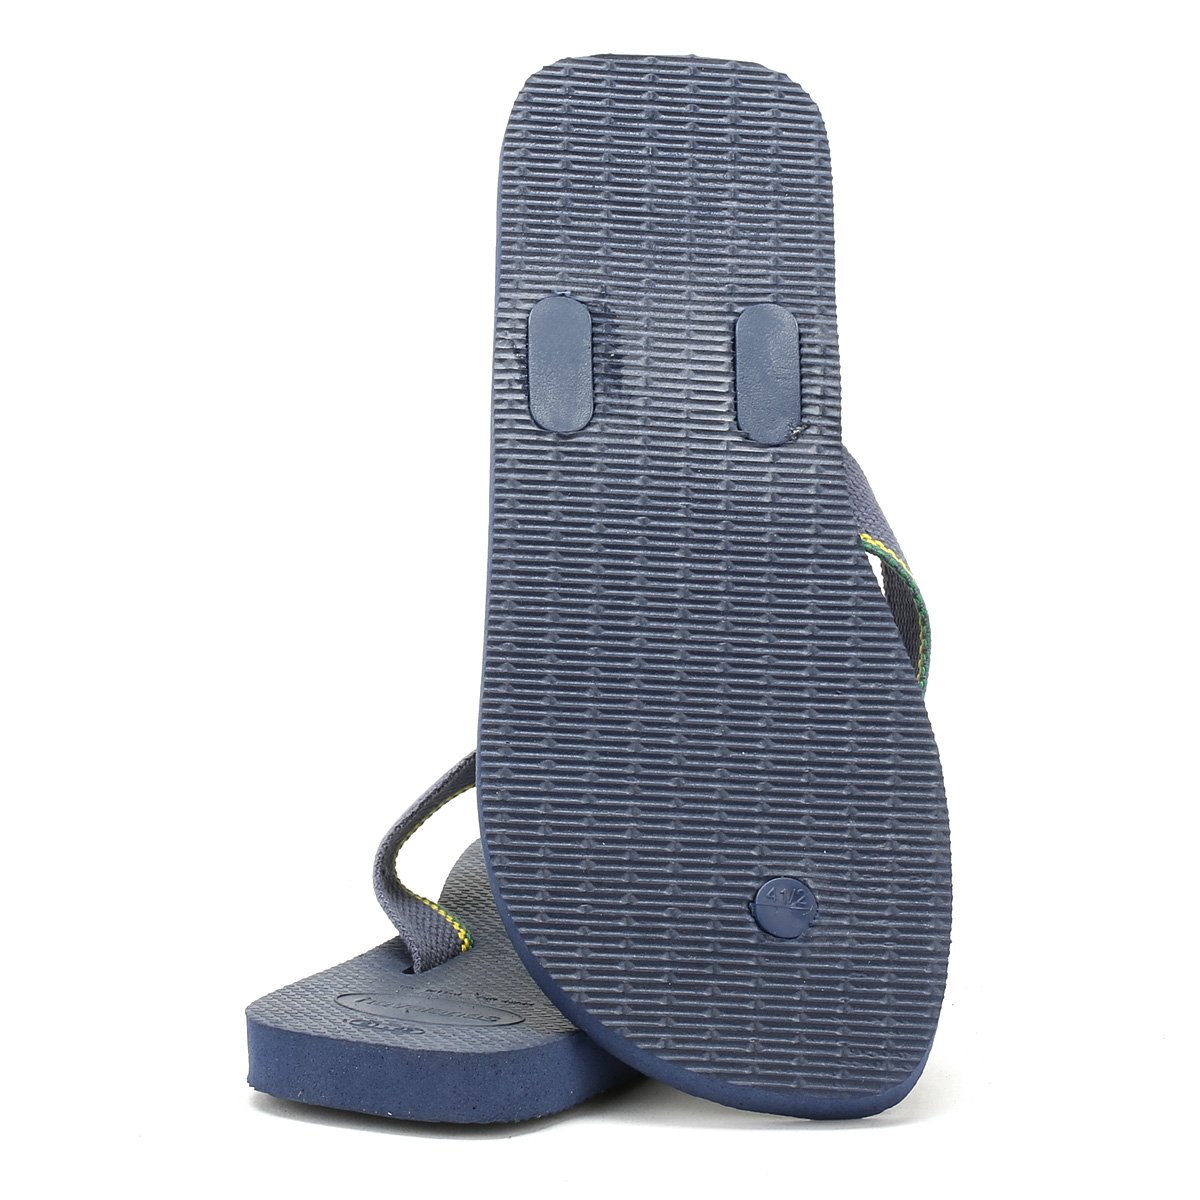 26c6cd41ad45f Havaianas Mens Navy Urban Brasil Flip Flops Beach Summer Thong Shoes ...